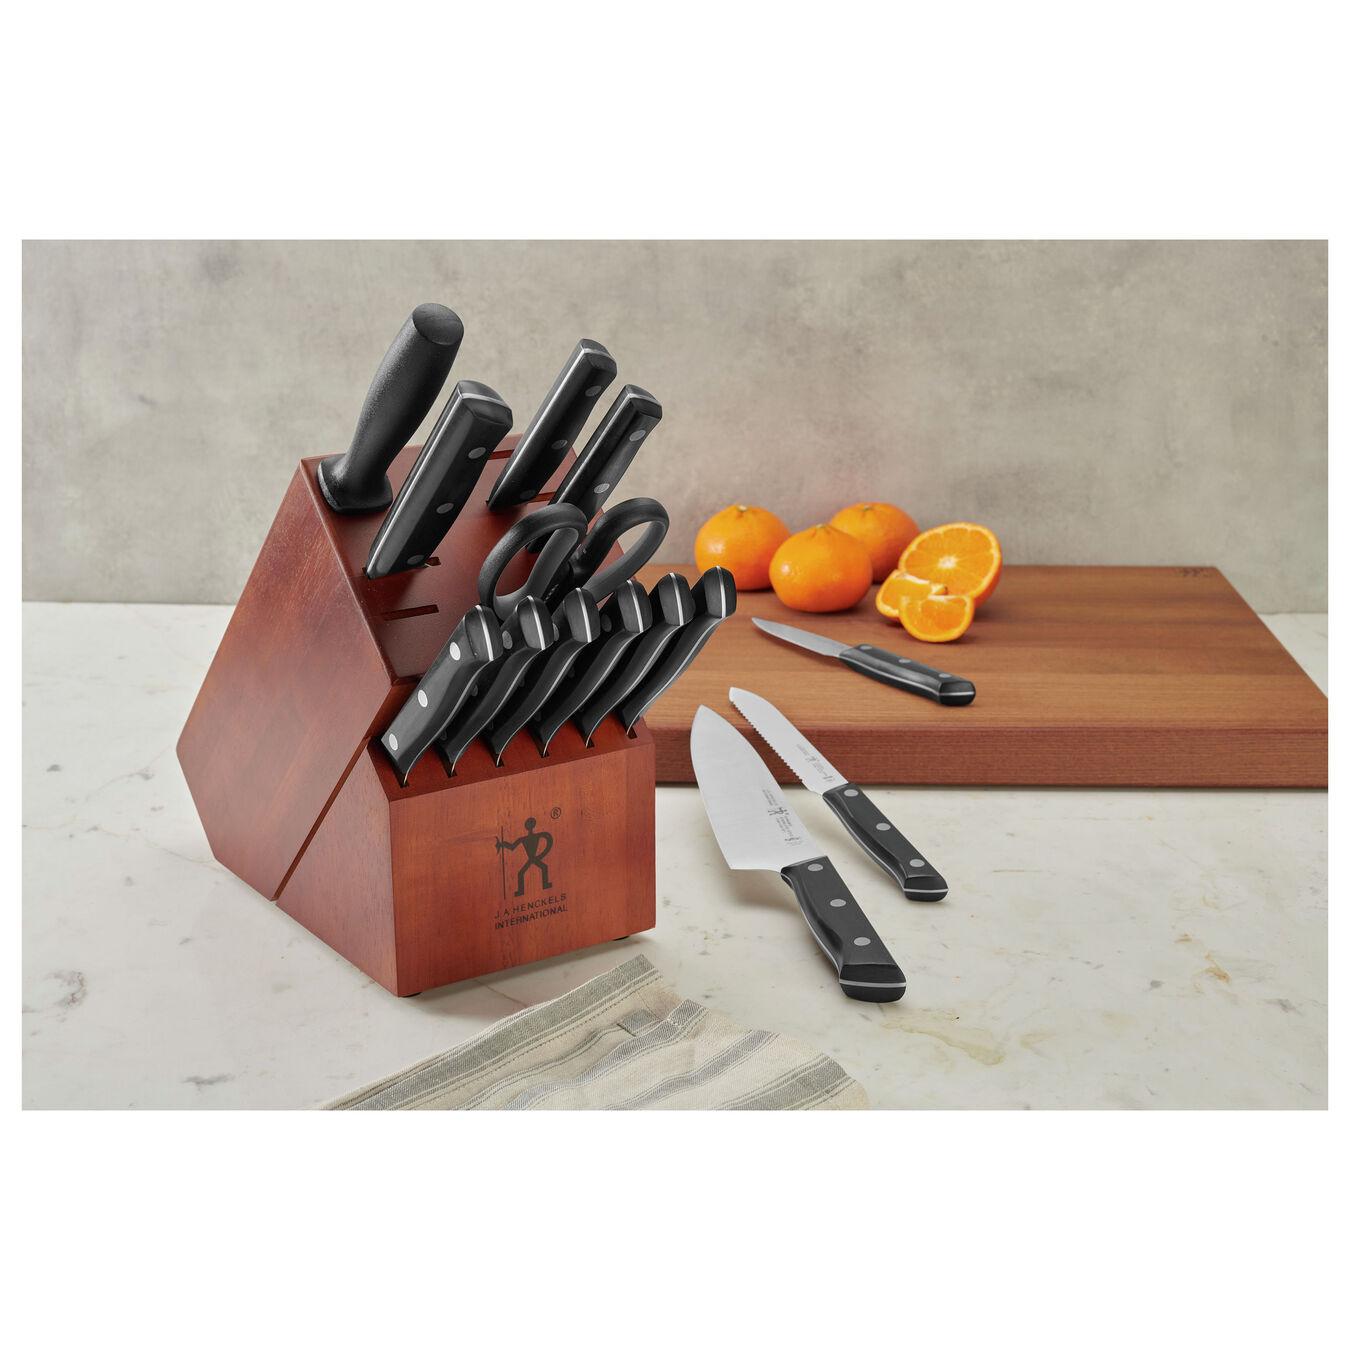 15 Piece Knife block set,,large 2